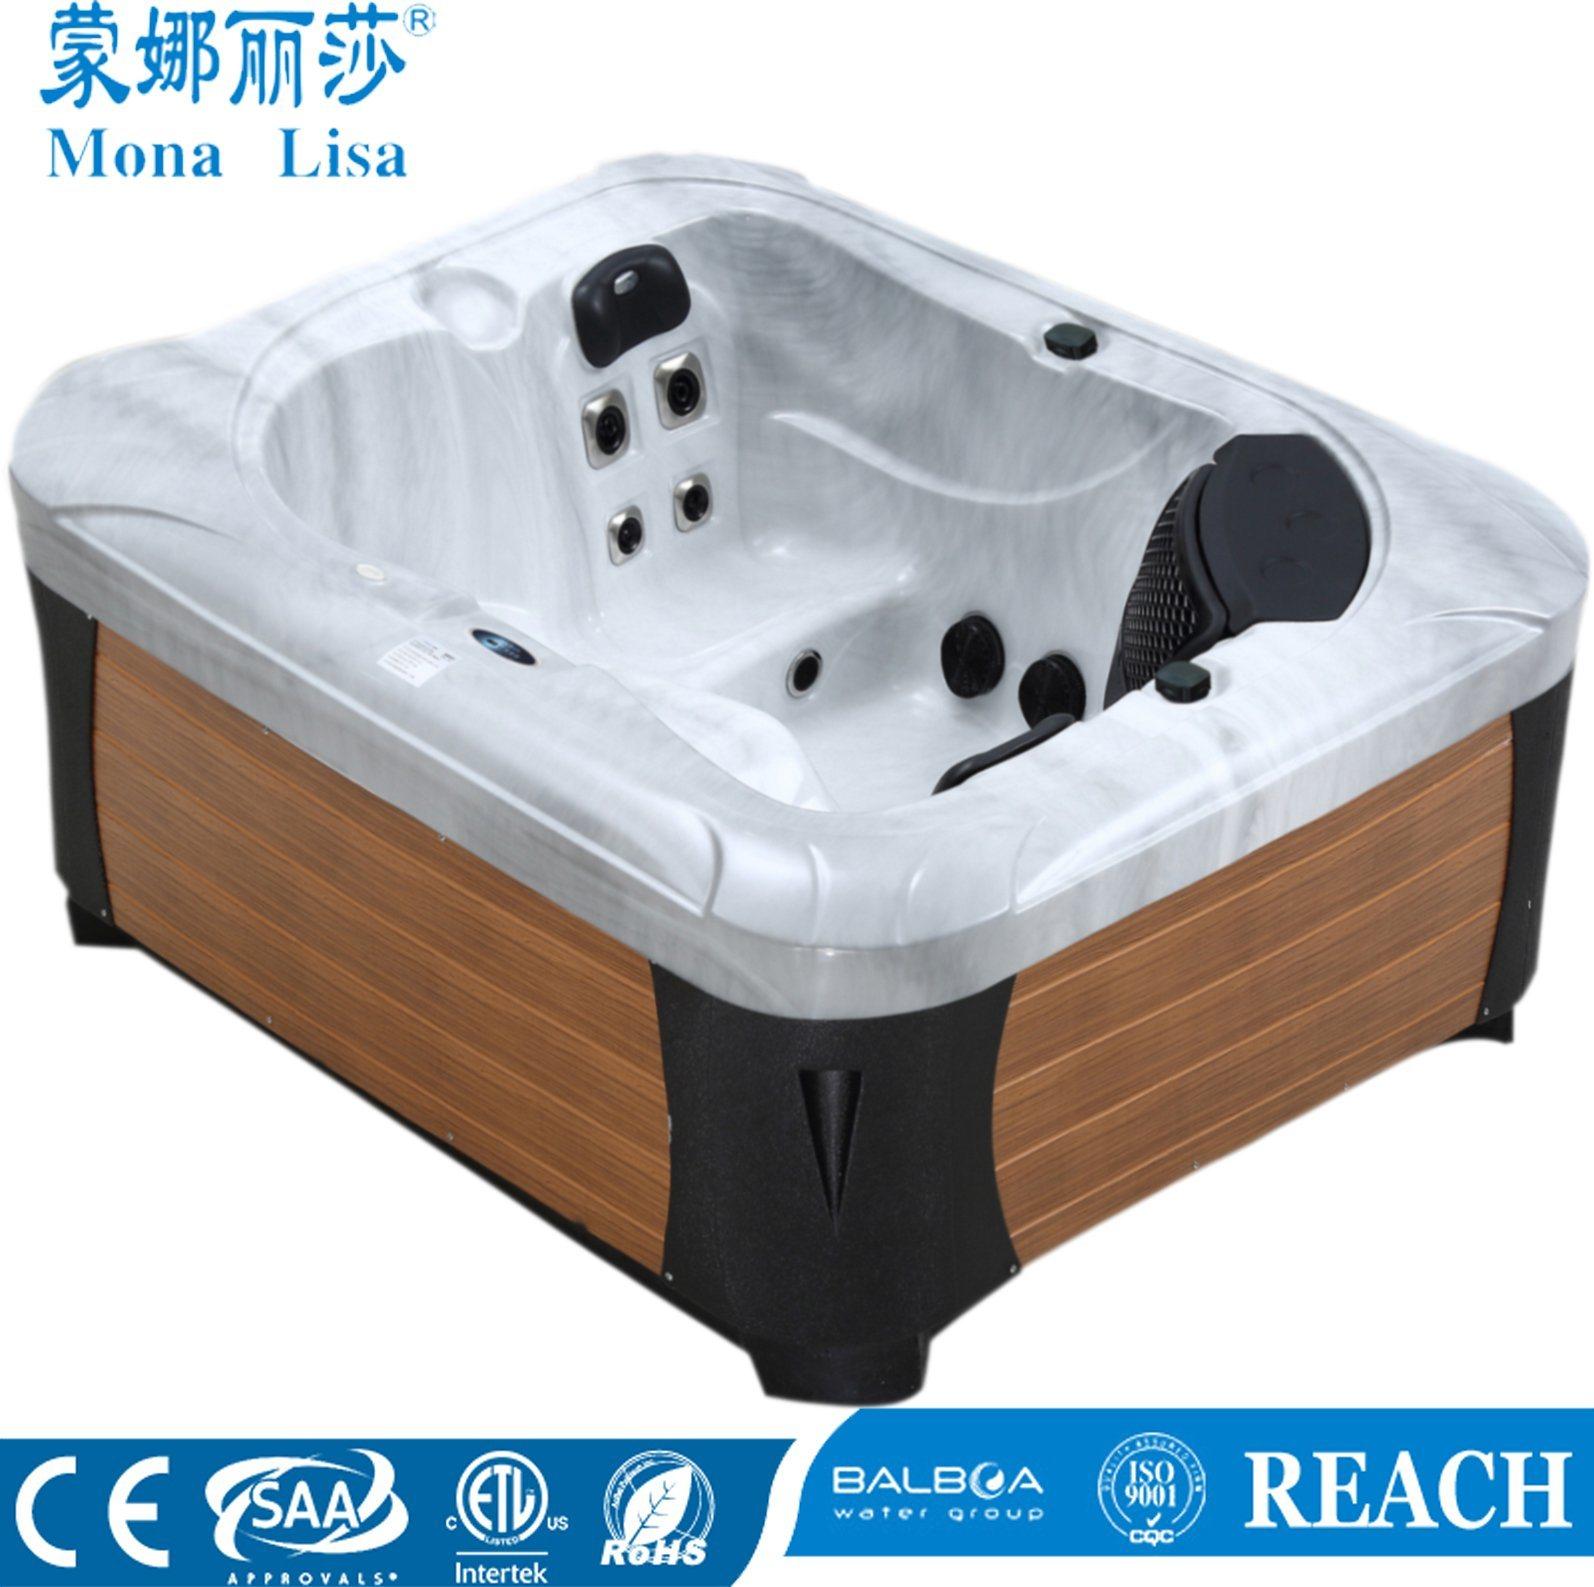 China Monalisa Outdoor Jacuzzi Bathtub (M-3399) - China Hexagon ...